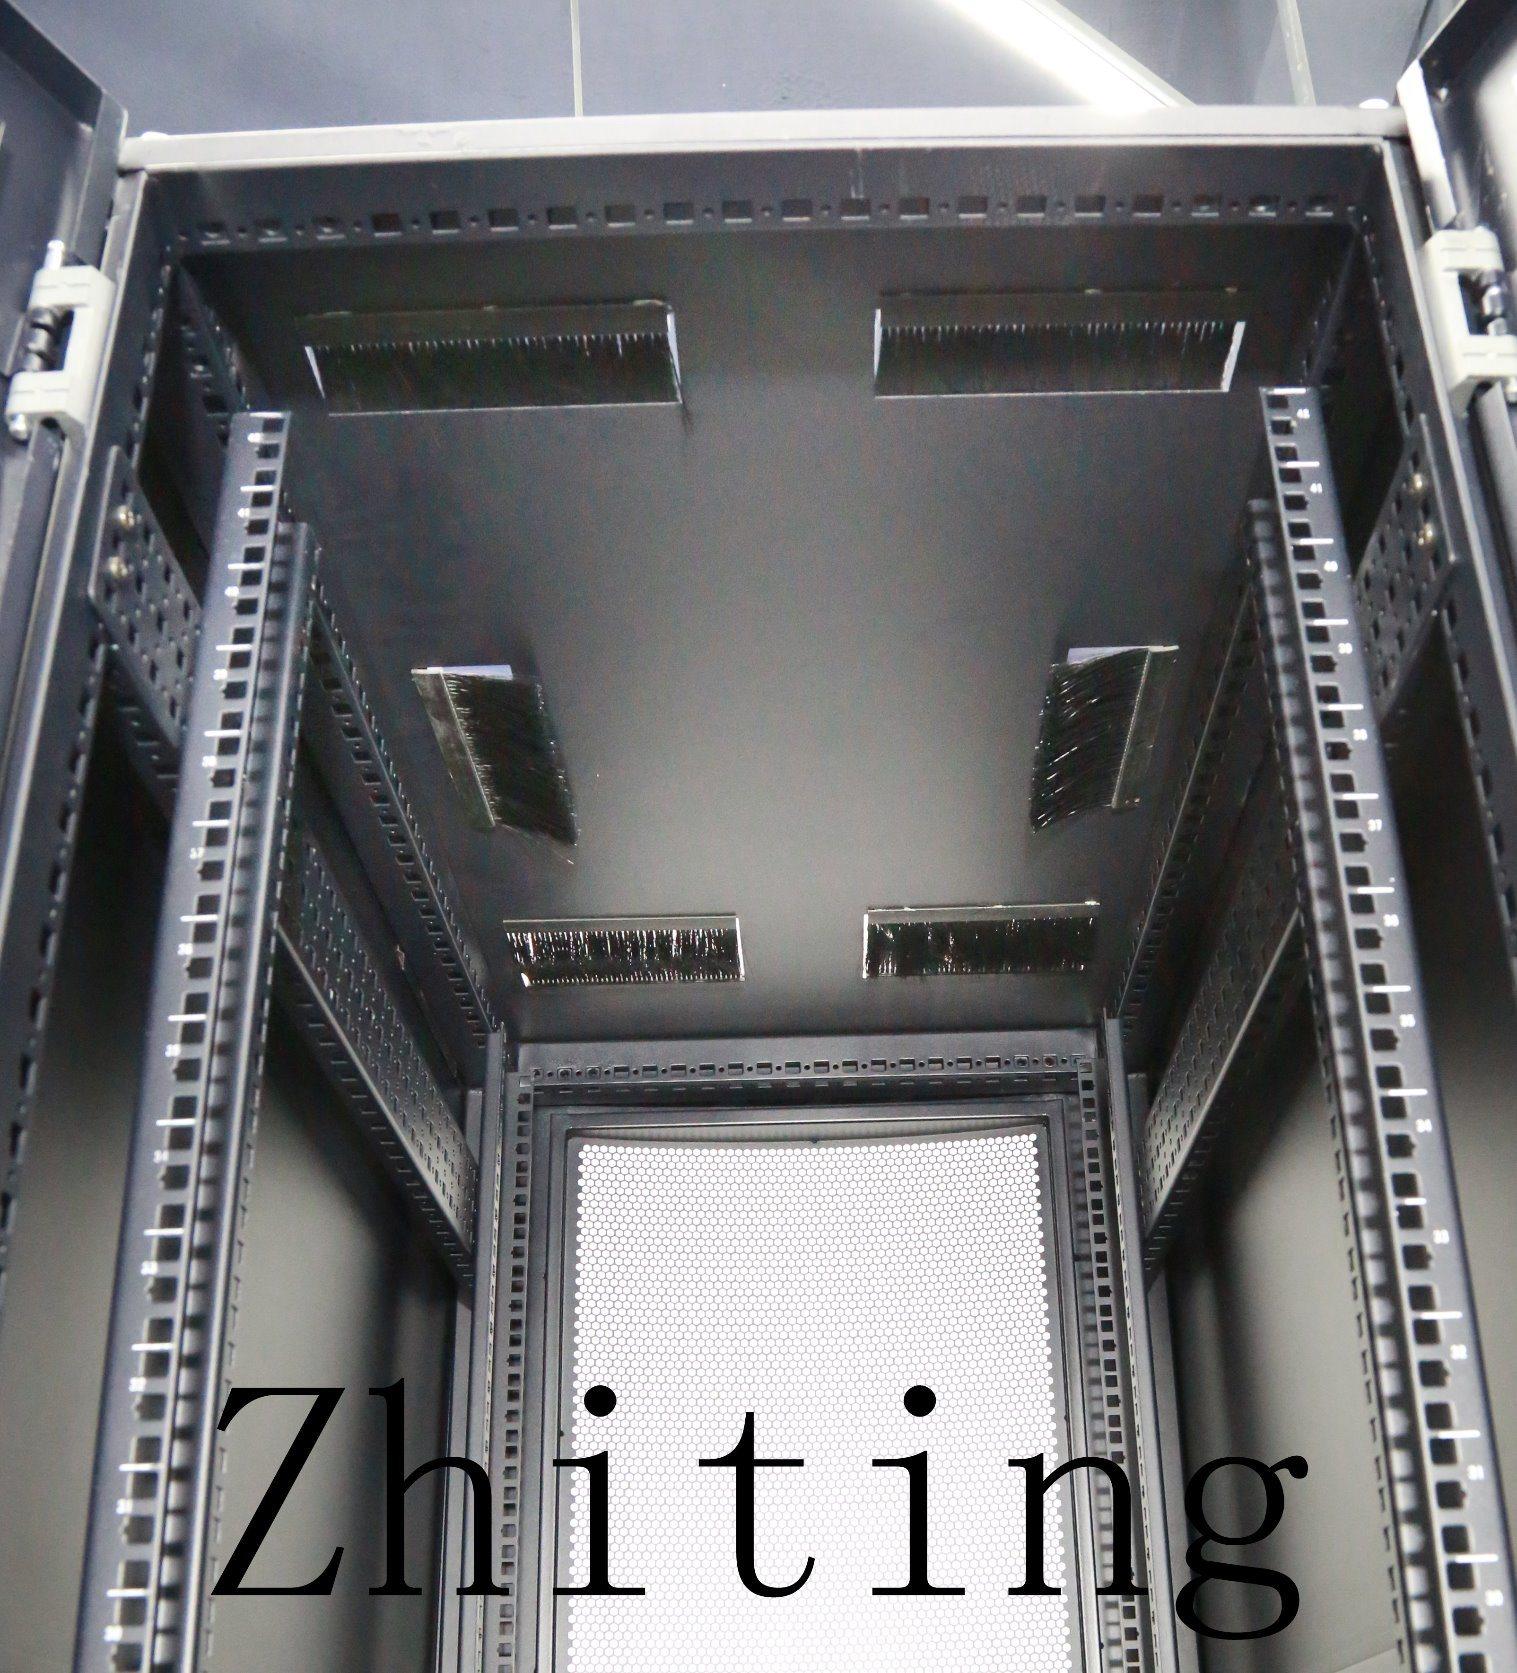 19 Inch Zt HS Series Server Cabinet Enclosures